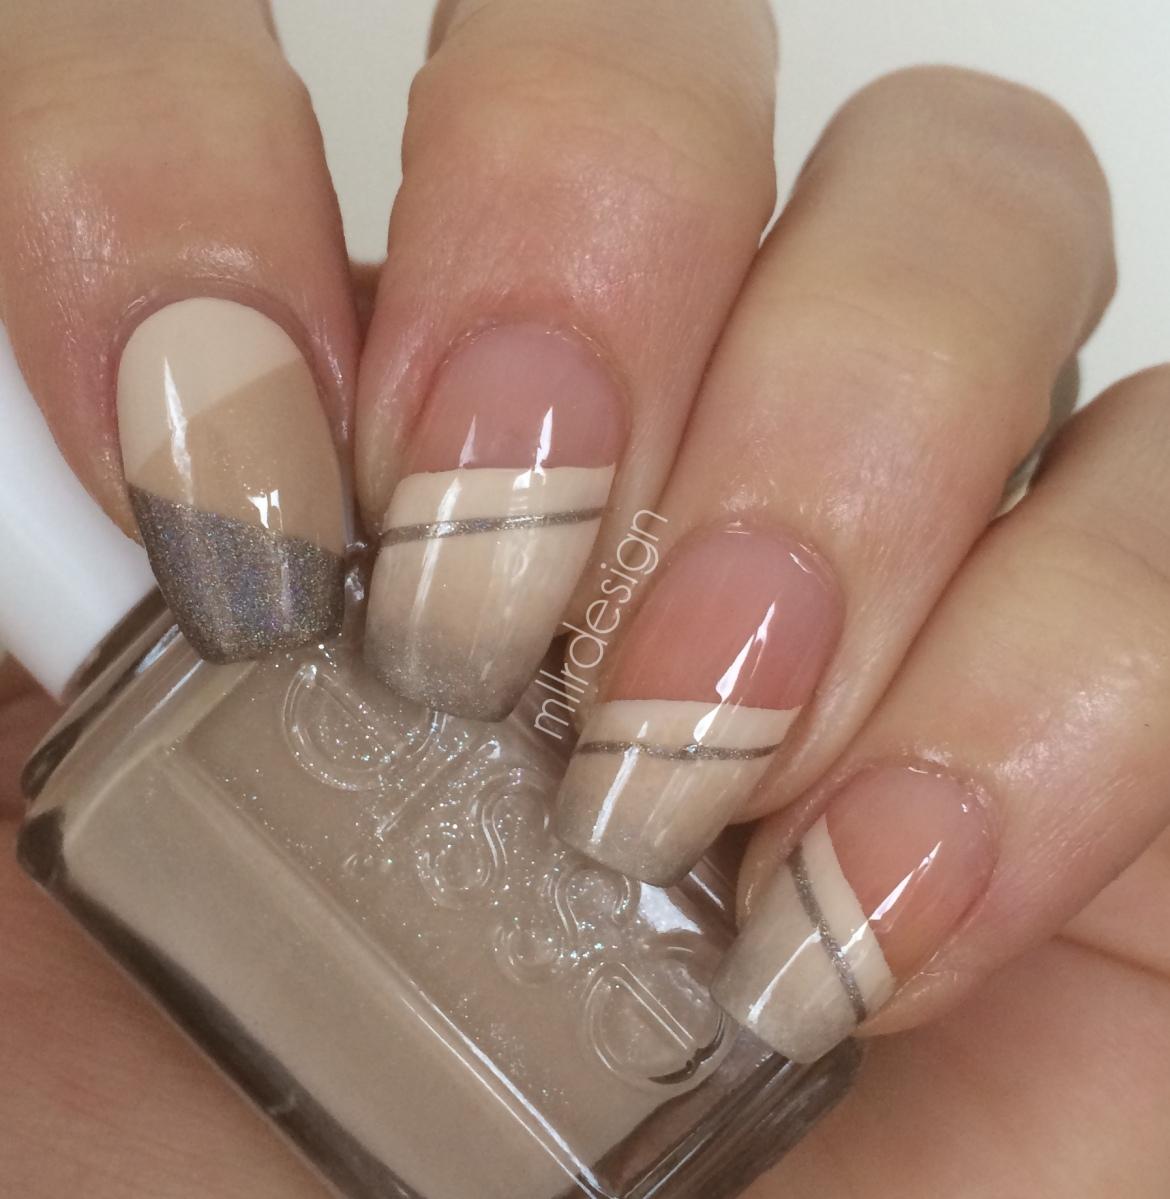 Nail Designs Beige - Nail Designs Beige - Nail Arts